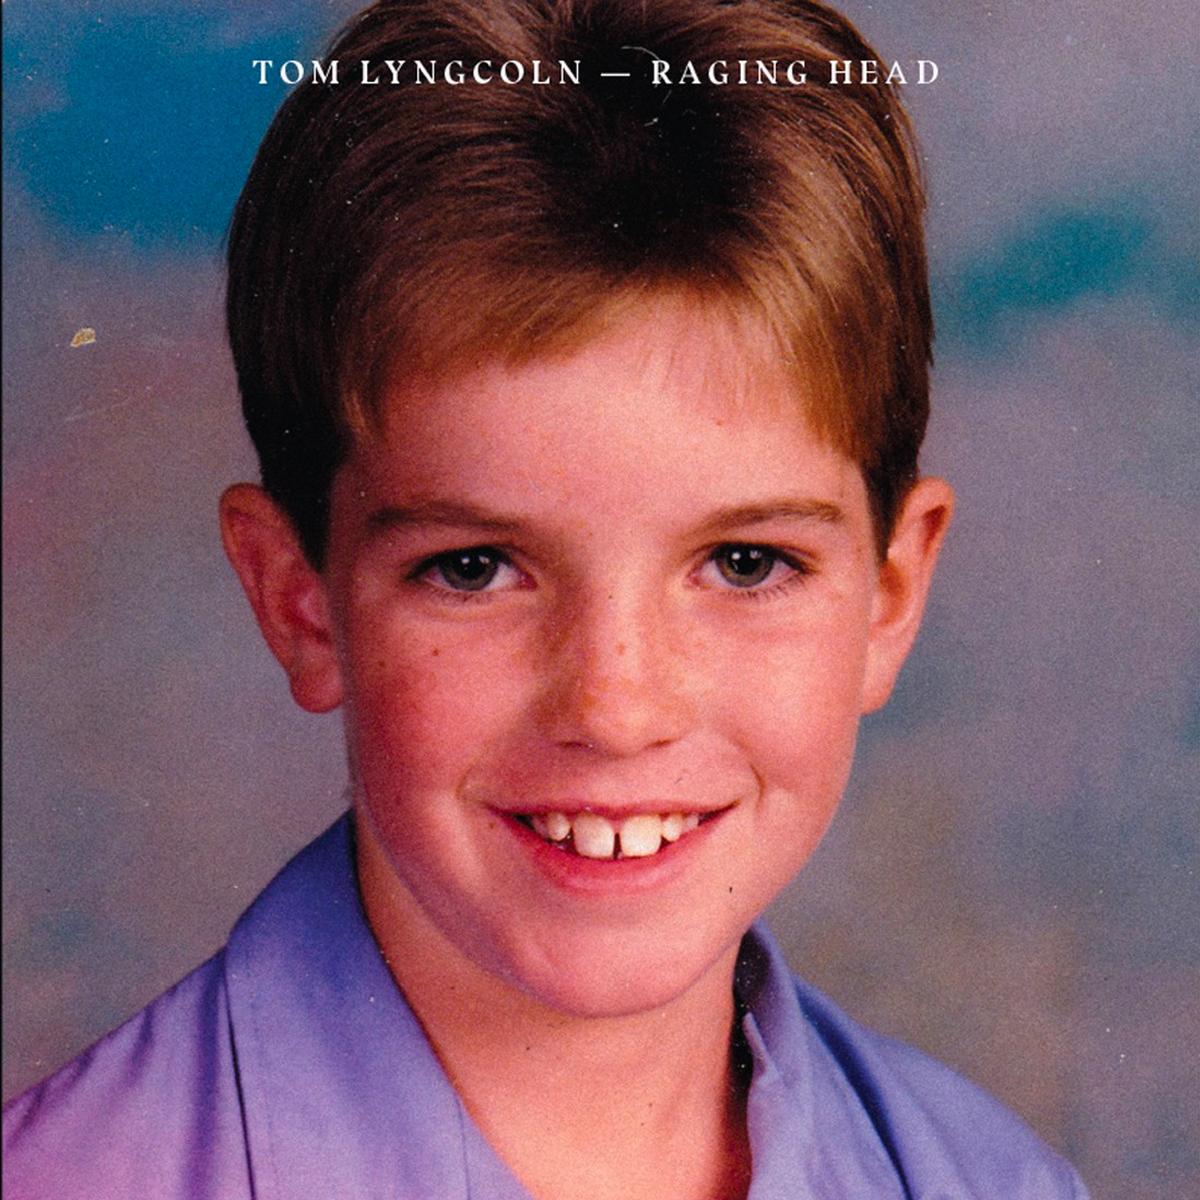 Tom Lyngcoln new solo album Raging Head 2020